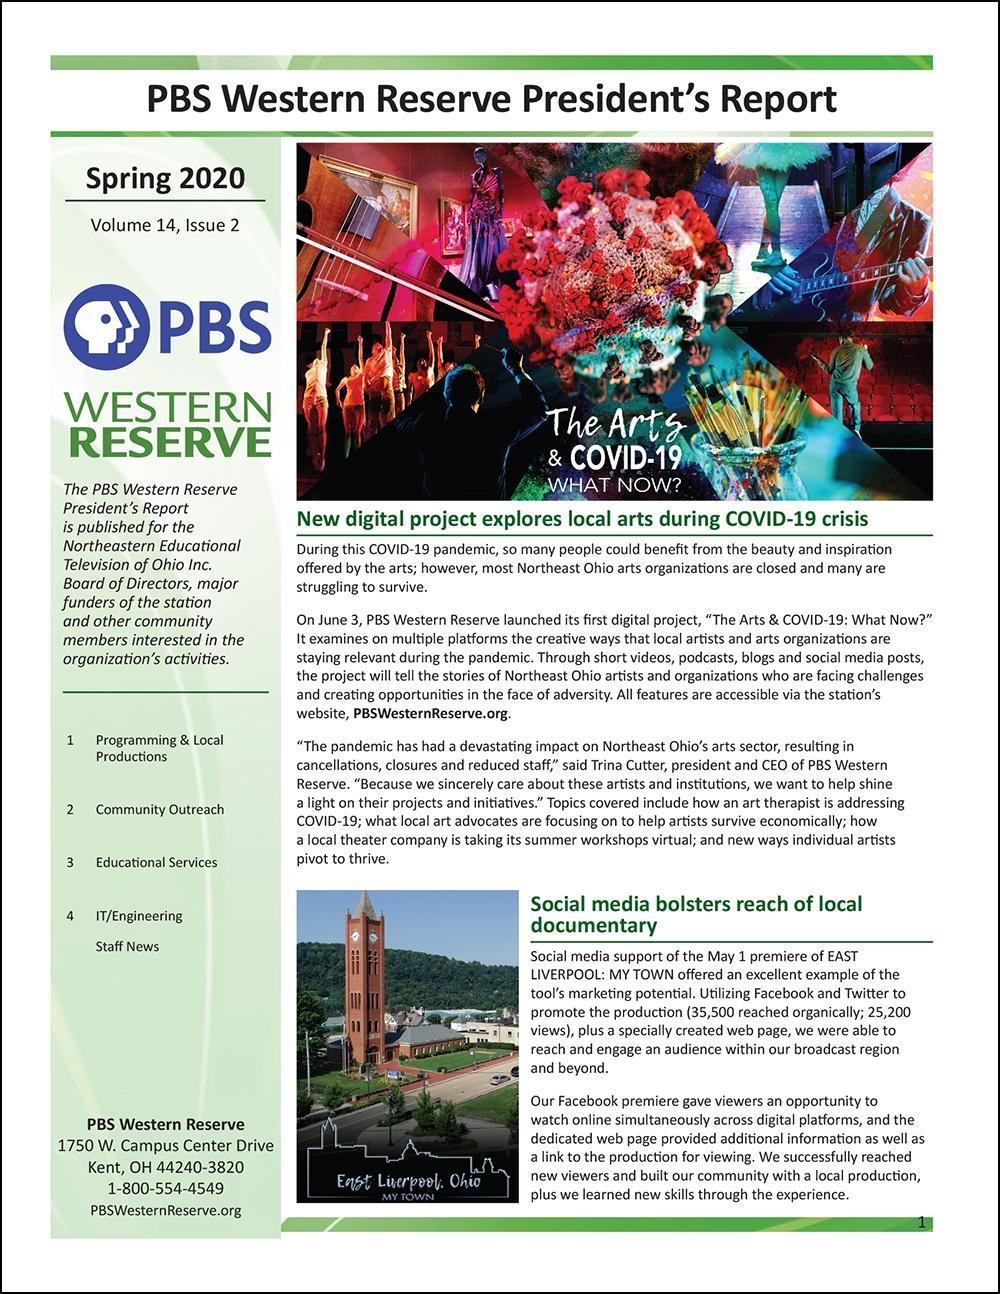 Spring 2020 - Volume 14, Issue 2